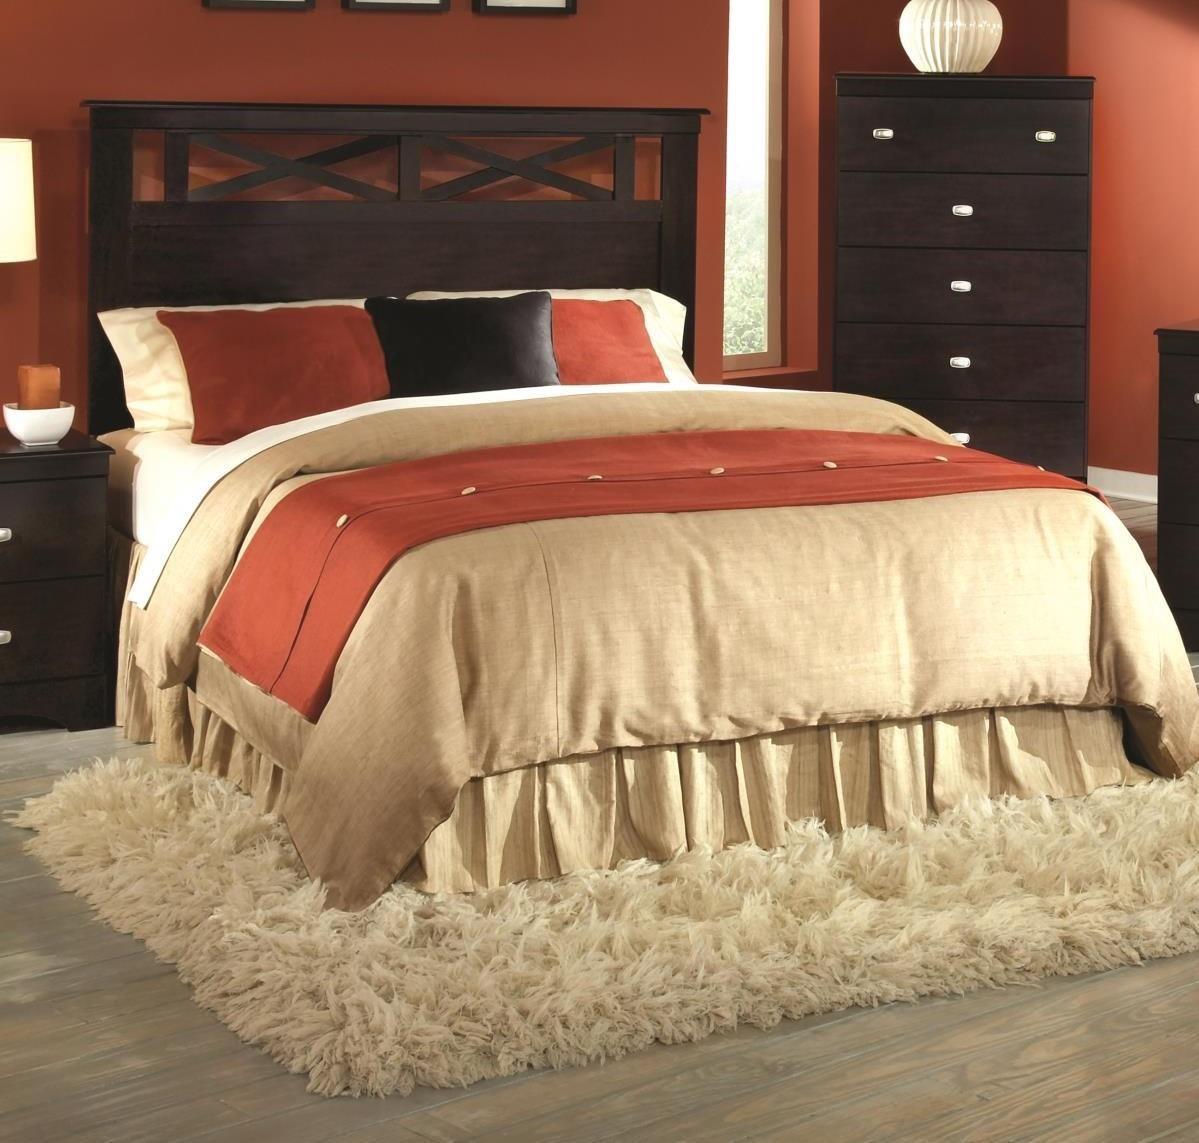 230 Tyler King Headboard by Kith Furniture at Furniture Fair - North Carolina